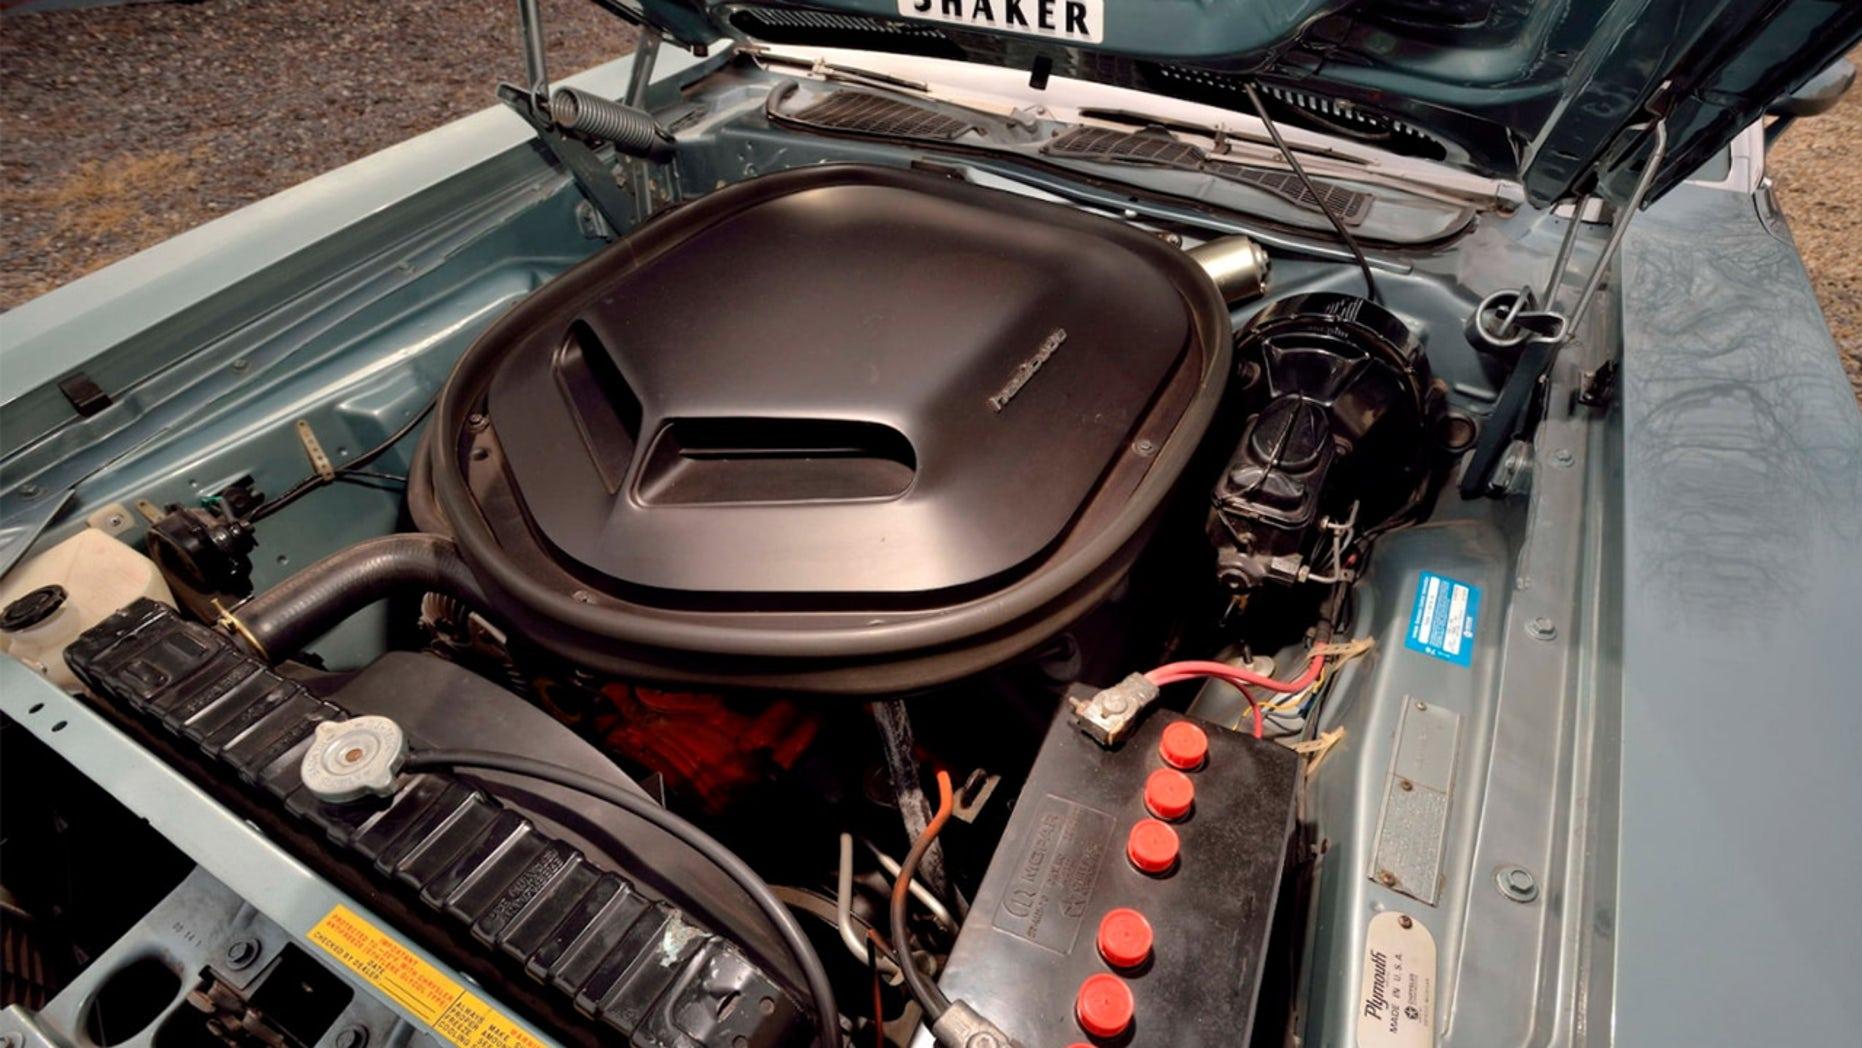 Ultra-rare 1971 Plymouth Cuda